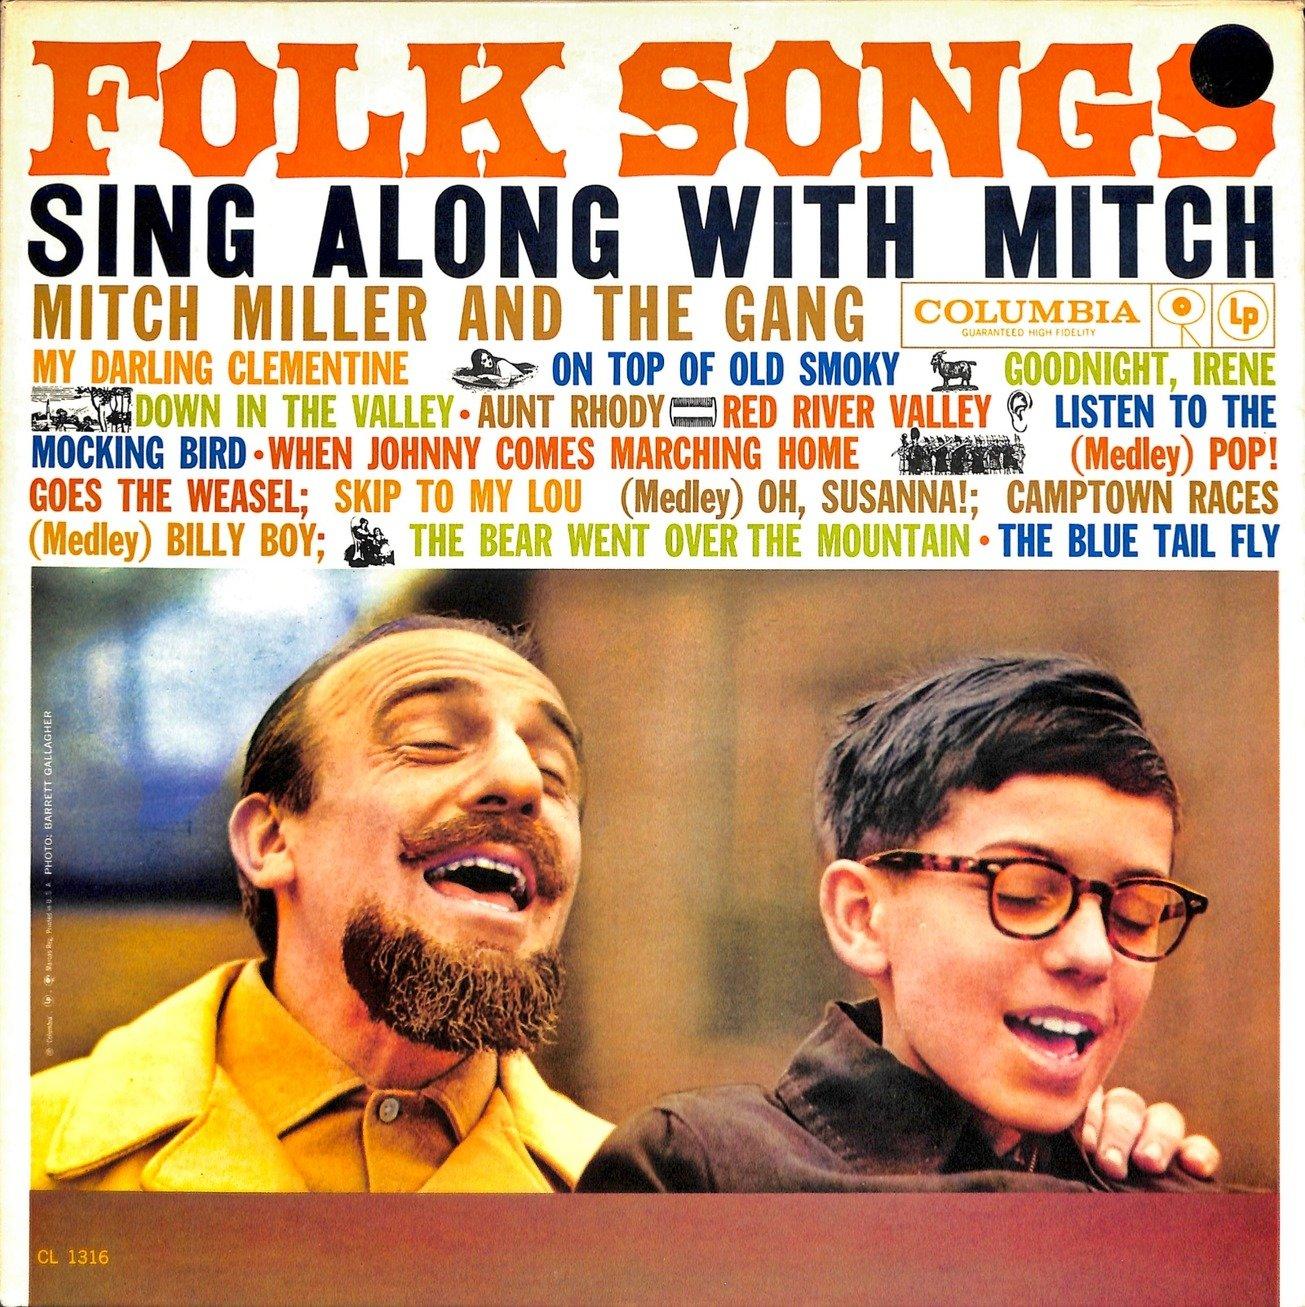 Mitch miller folk songs  28cl 1316 29